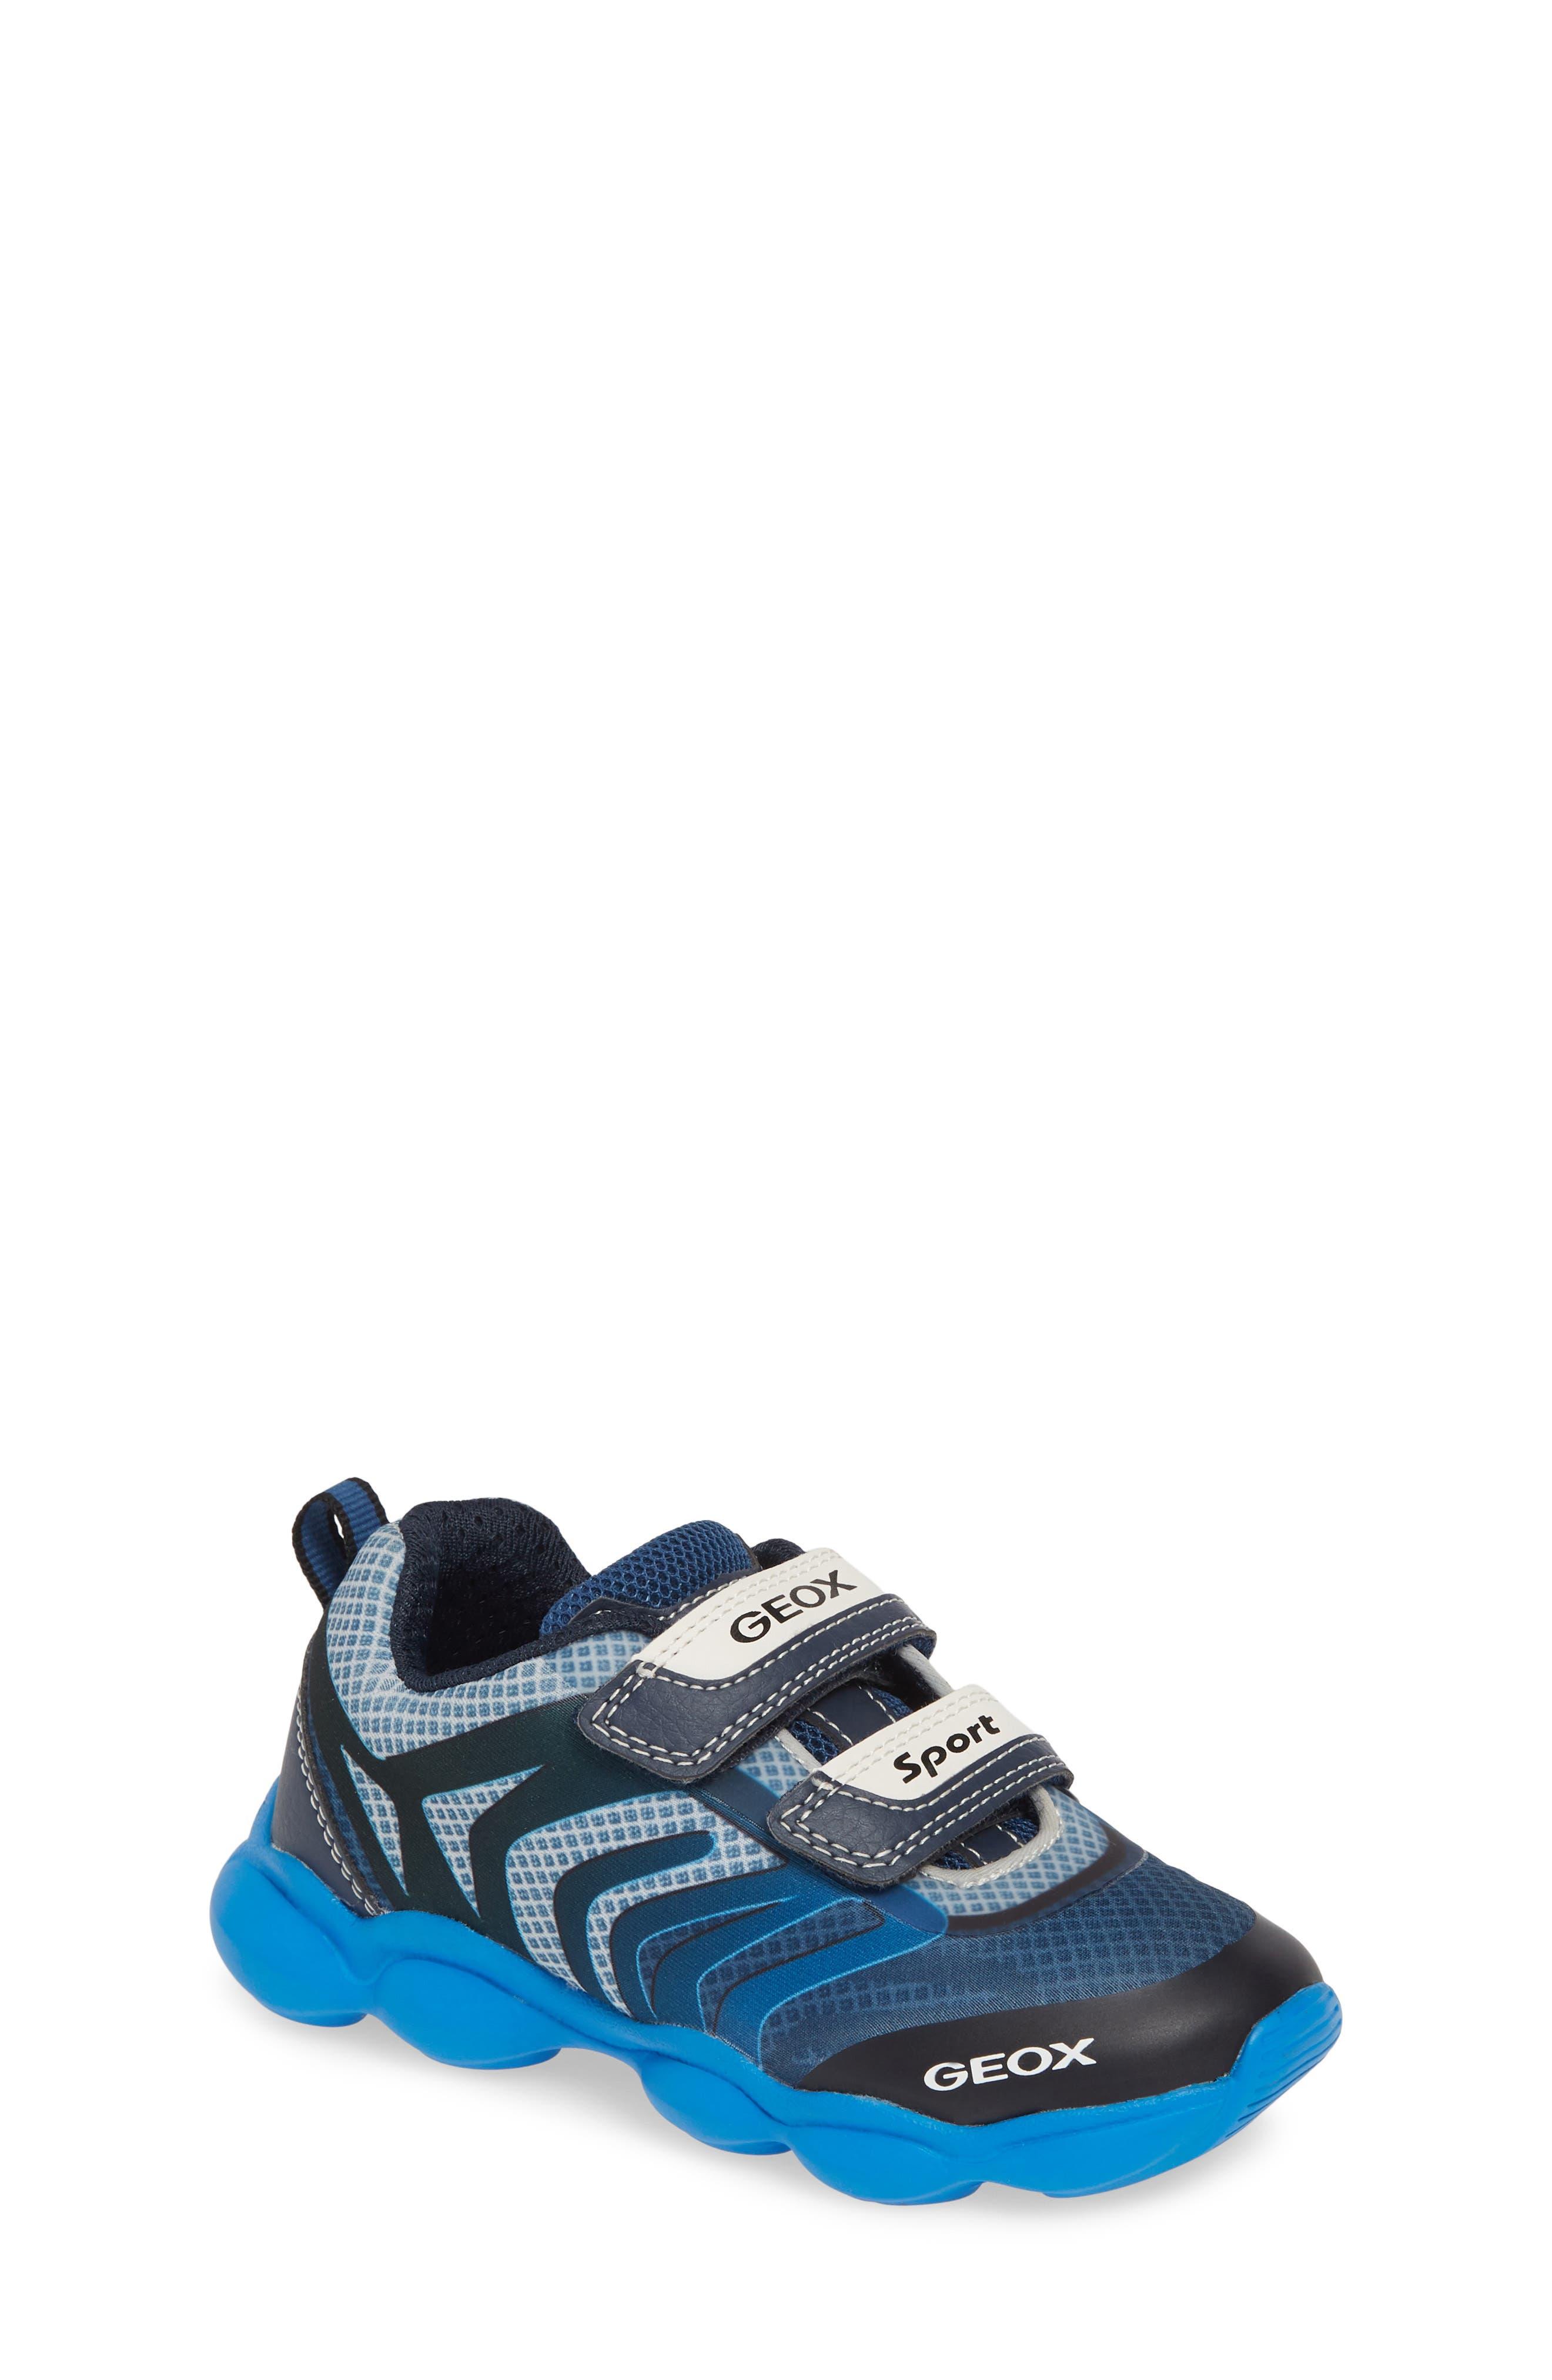 GEOX, J Munfrey Sneaker, Main thumbnail 1, color, NAVY/ AVIO